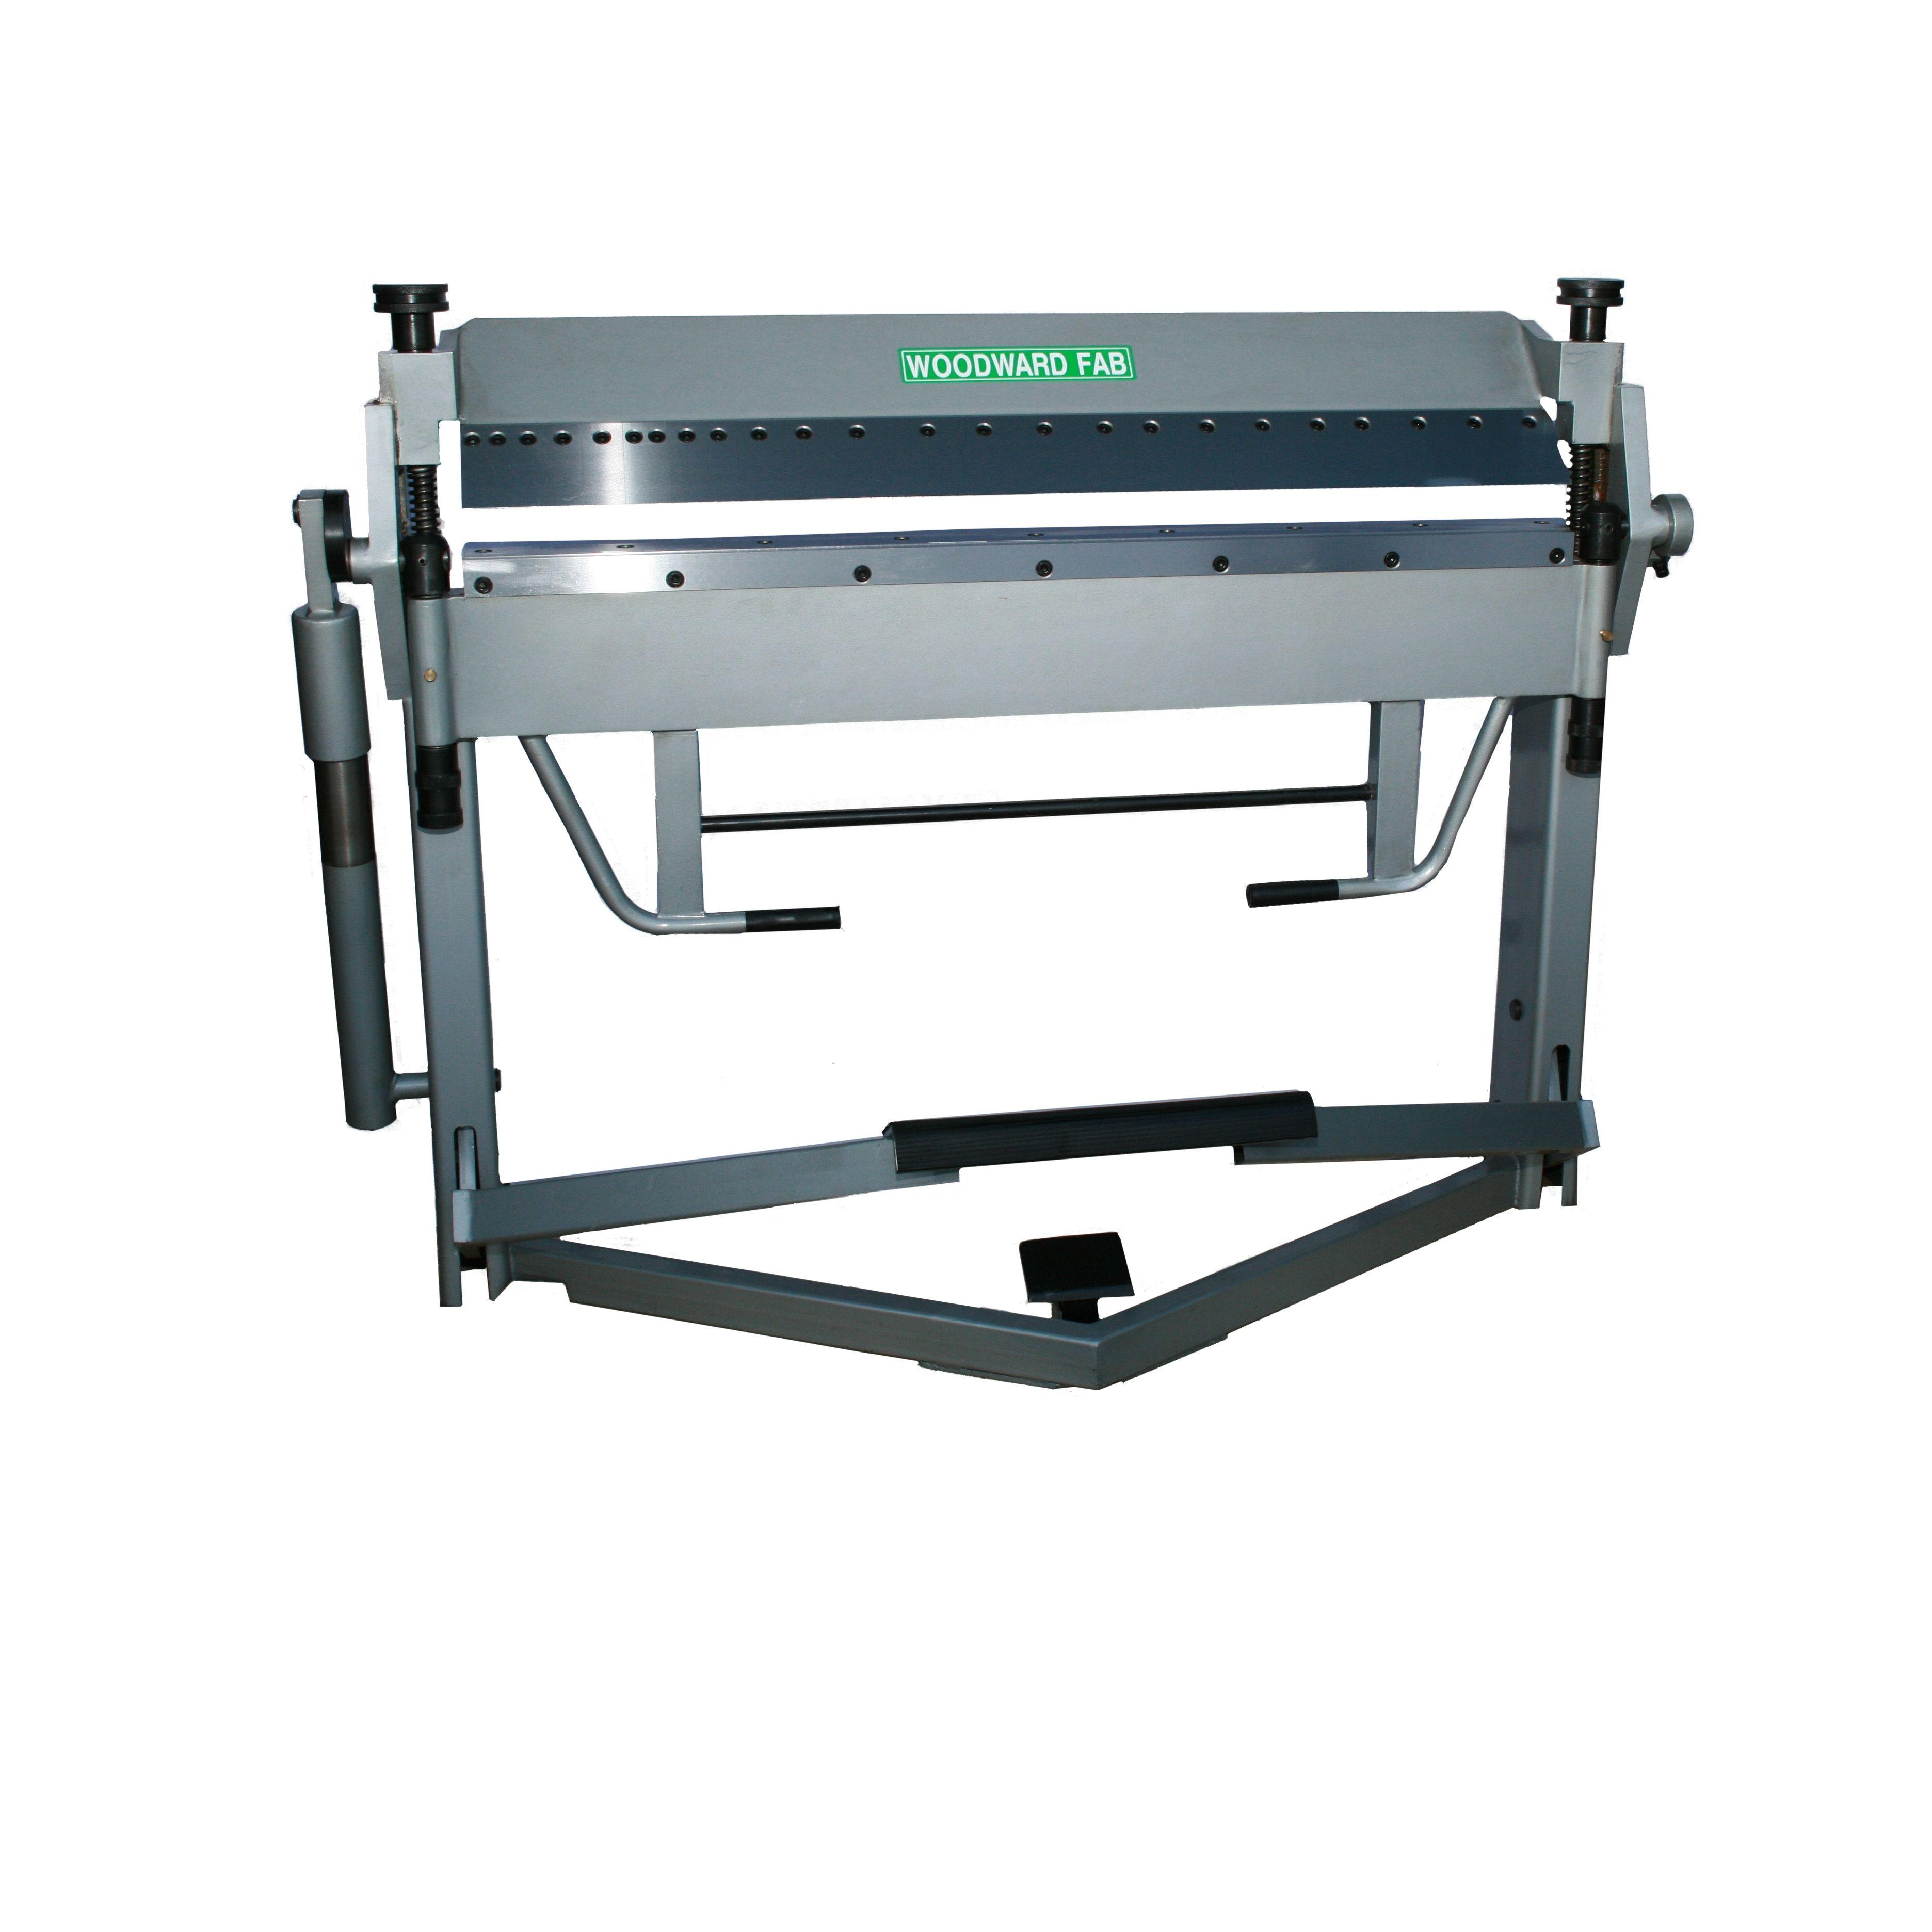 Box And Pan Bending Brakes Wfbp5014 Metal Bending Tools Metal Bending Sheet Metal Brake